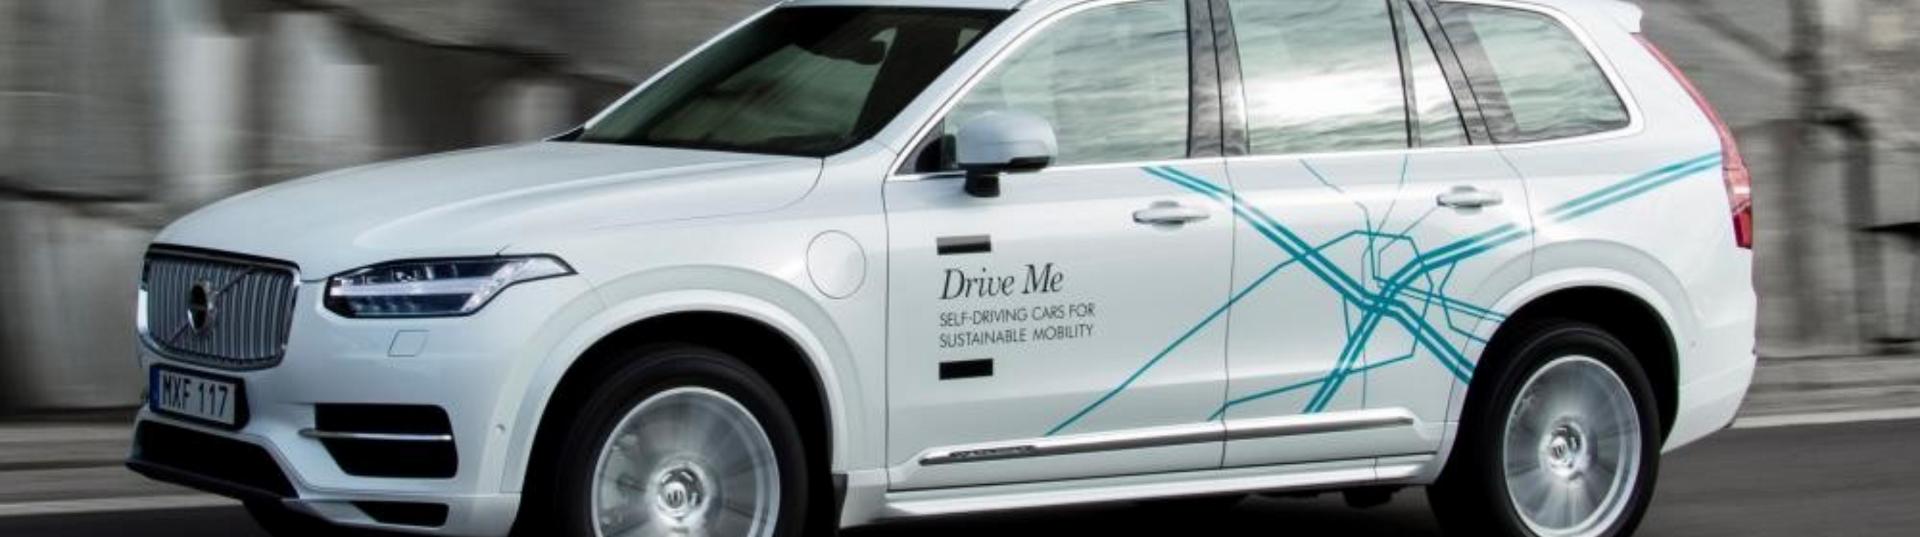 Drive Me_Volvo_1920